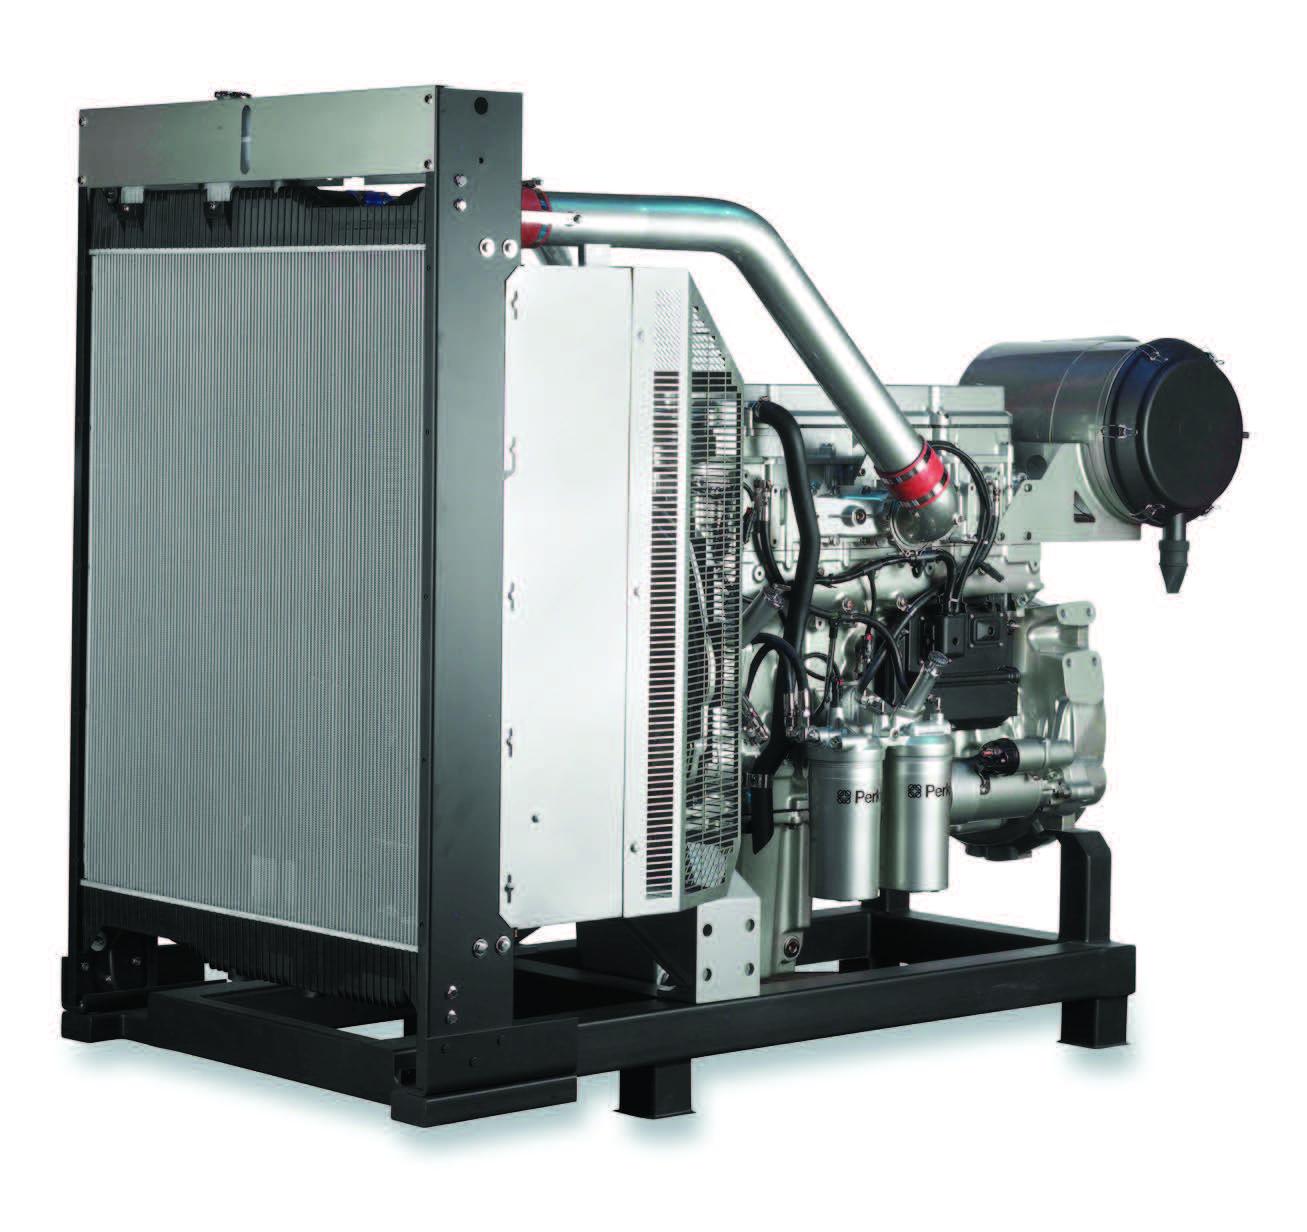 2206D-E13TAG2 Diesel Engine - ElectropaK